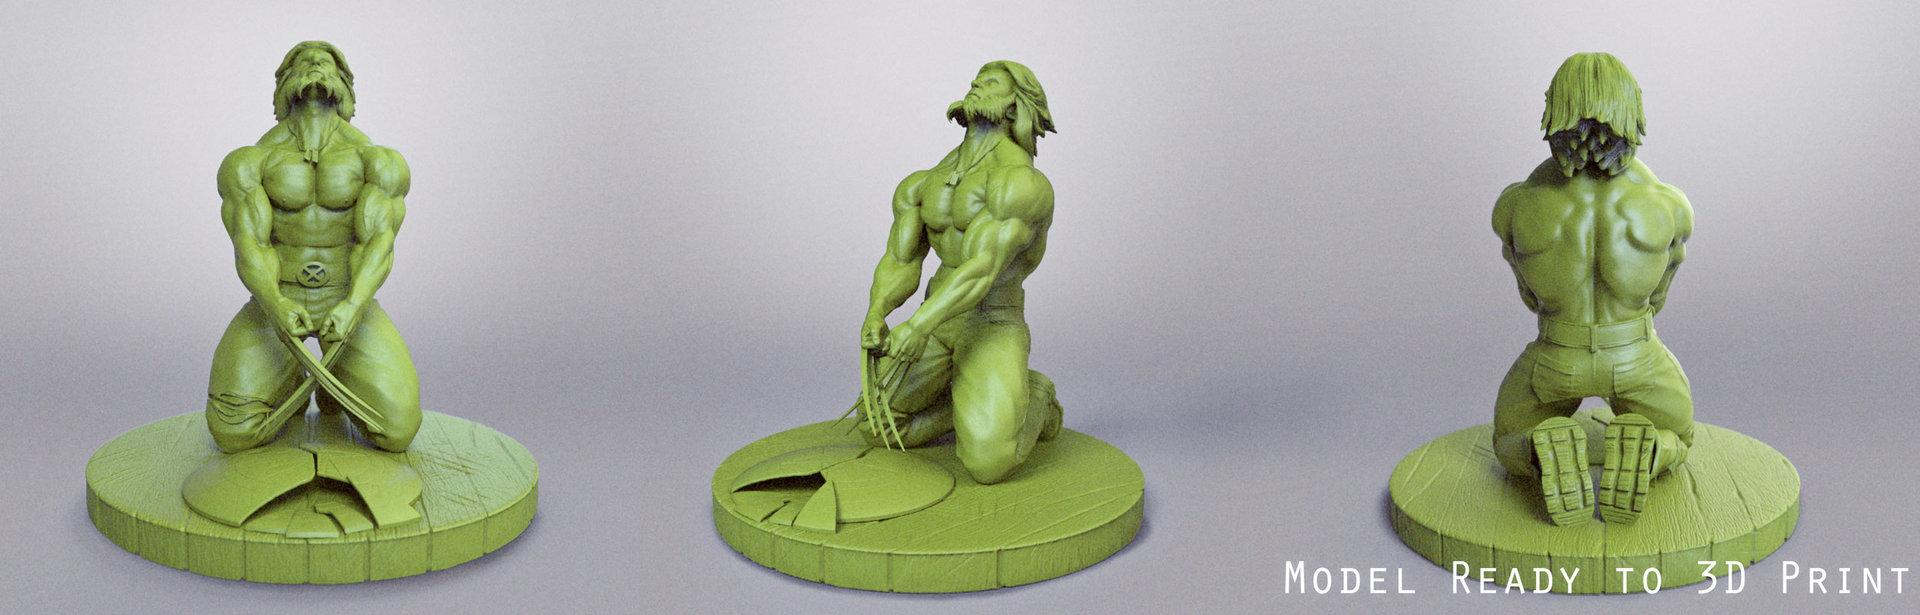 Pascal ackermann wolverine figurine k11